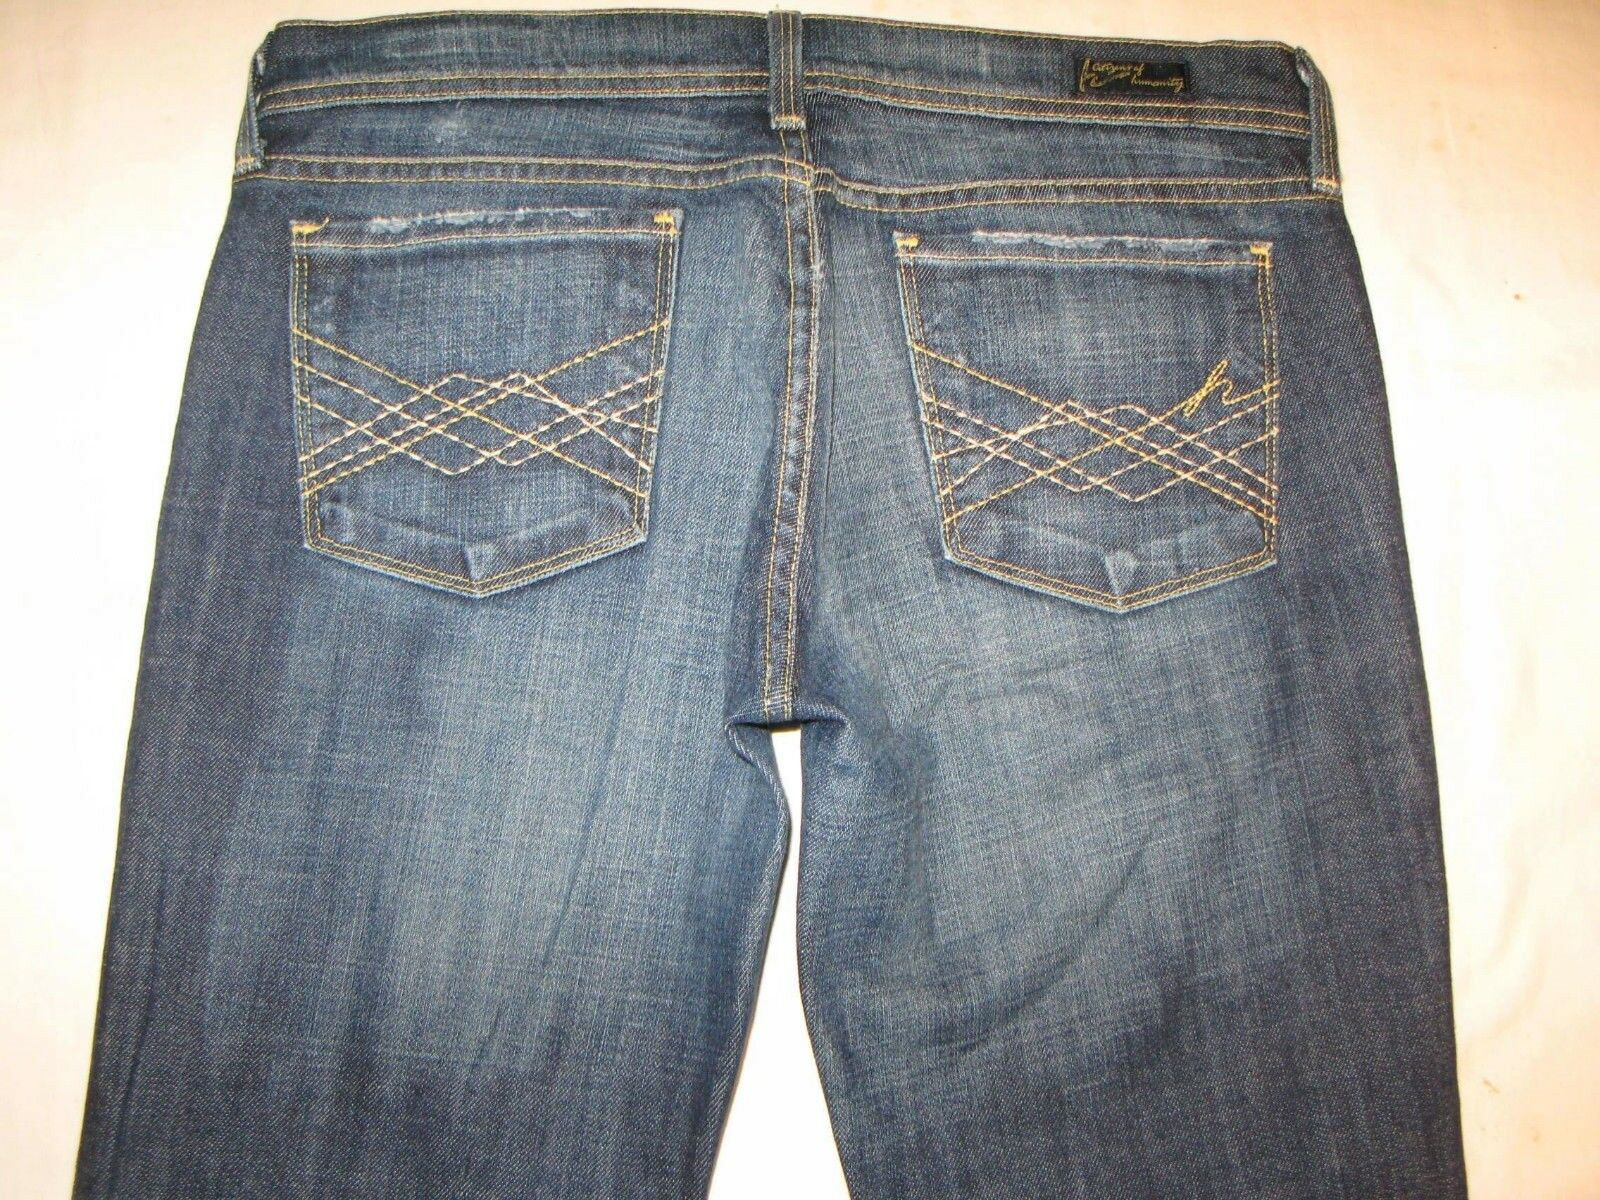 Citizens of Humanity Naomi 065 Jeans Sz 28 Low Flare DIstressed w Stretch